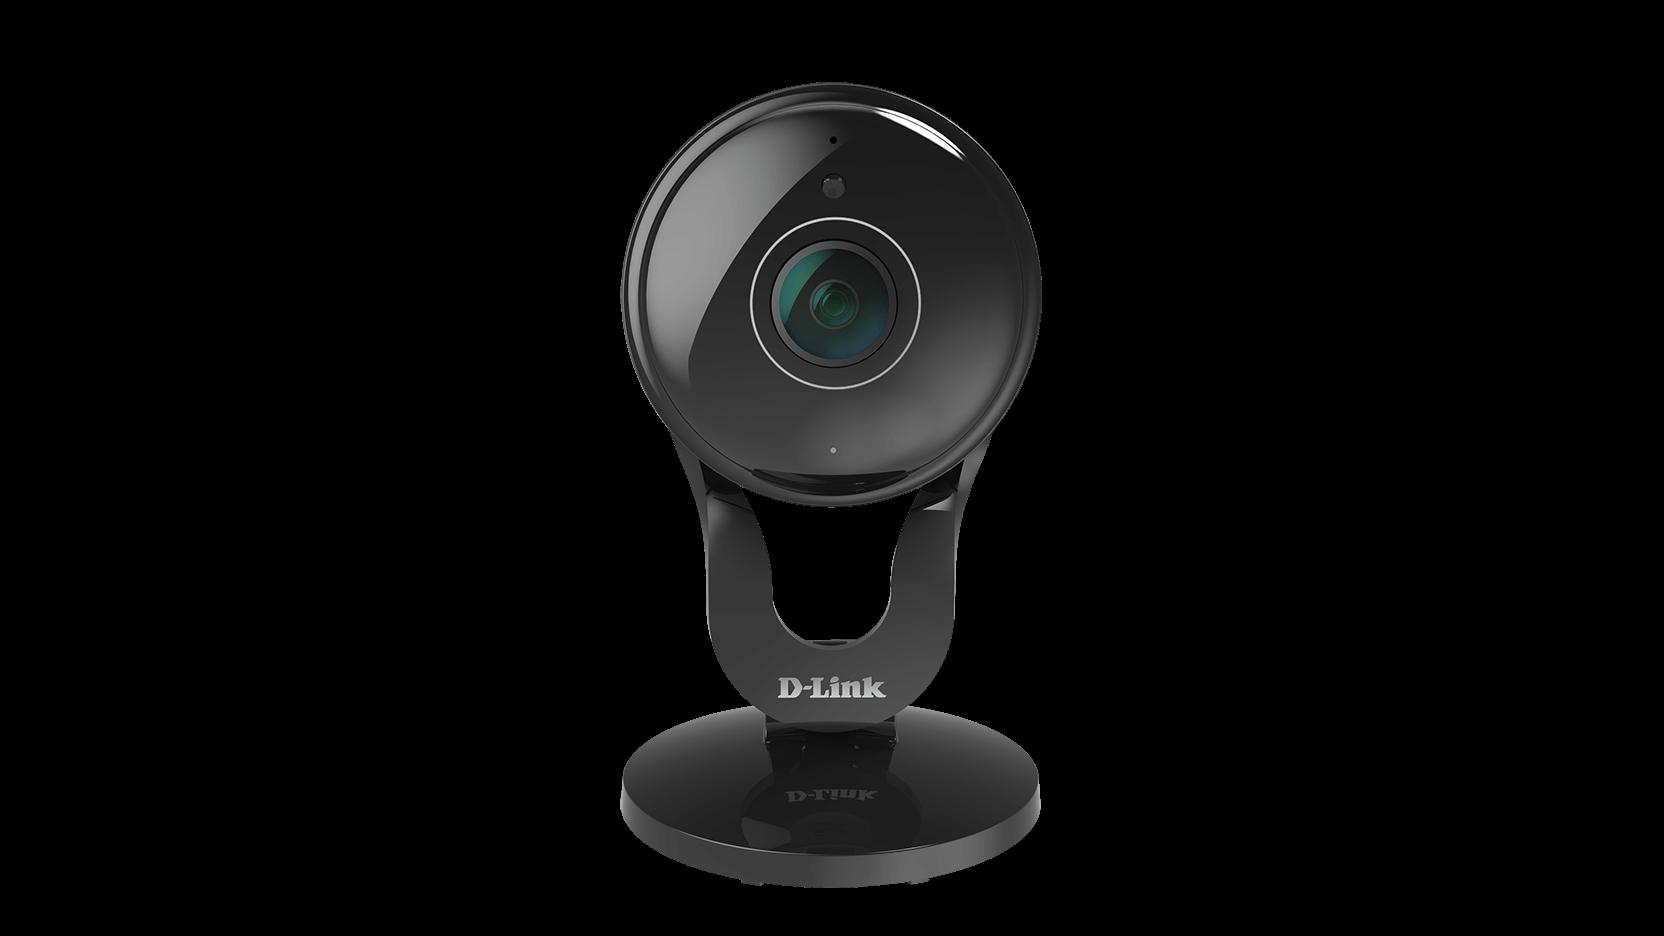 DCS-2530L Wide Eye Full HD 180° Panoramic Camera